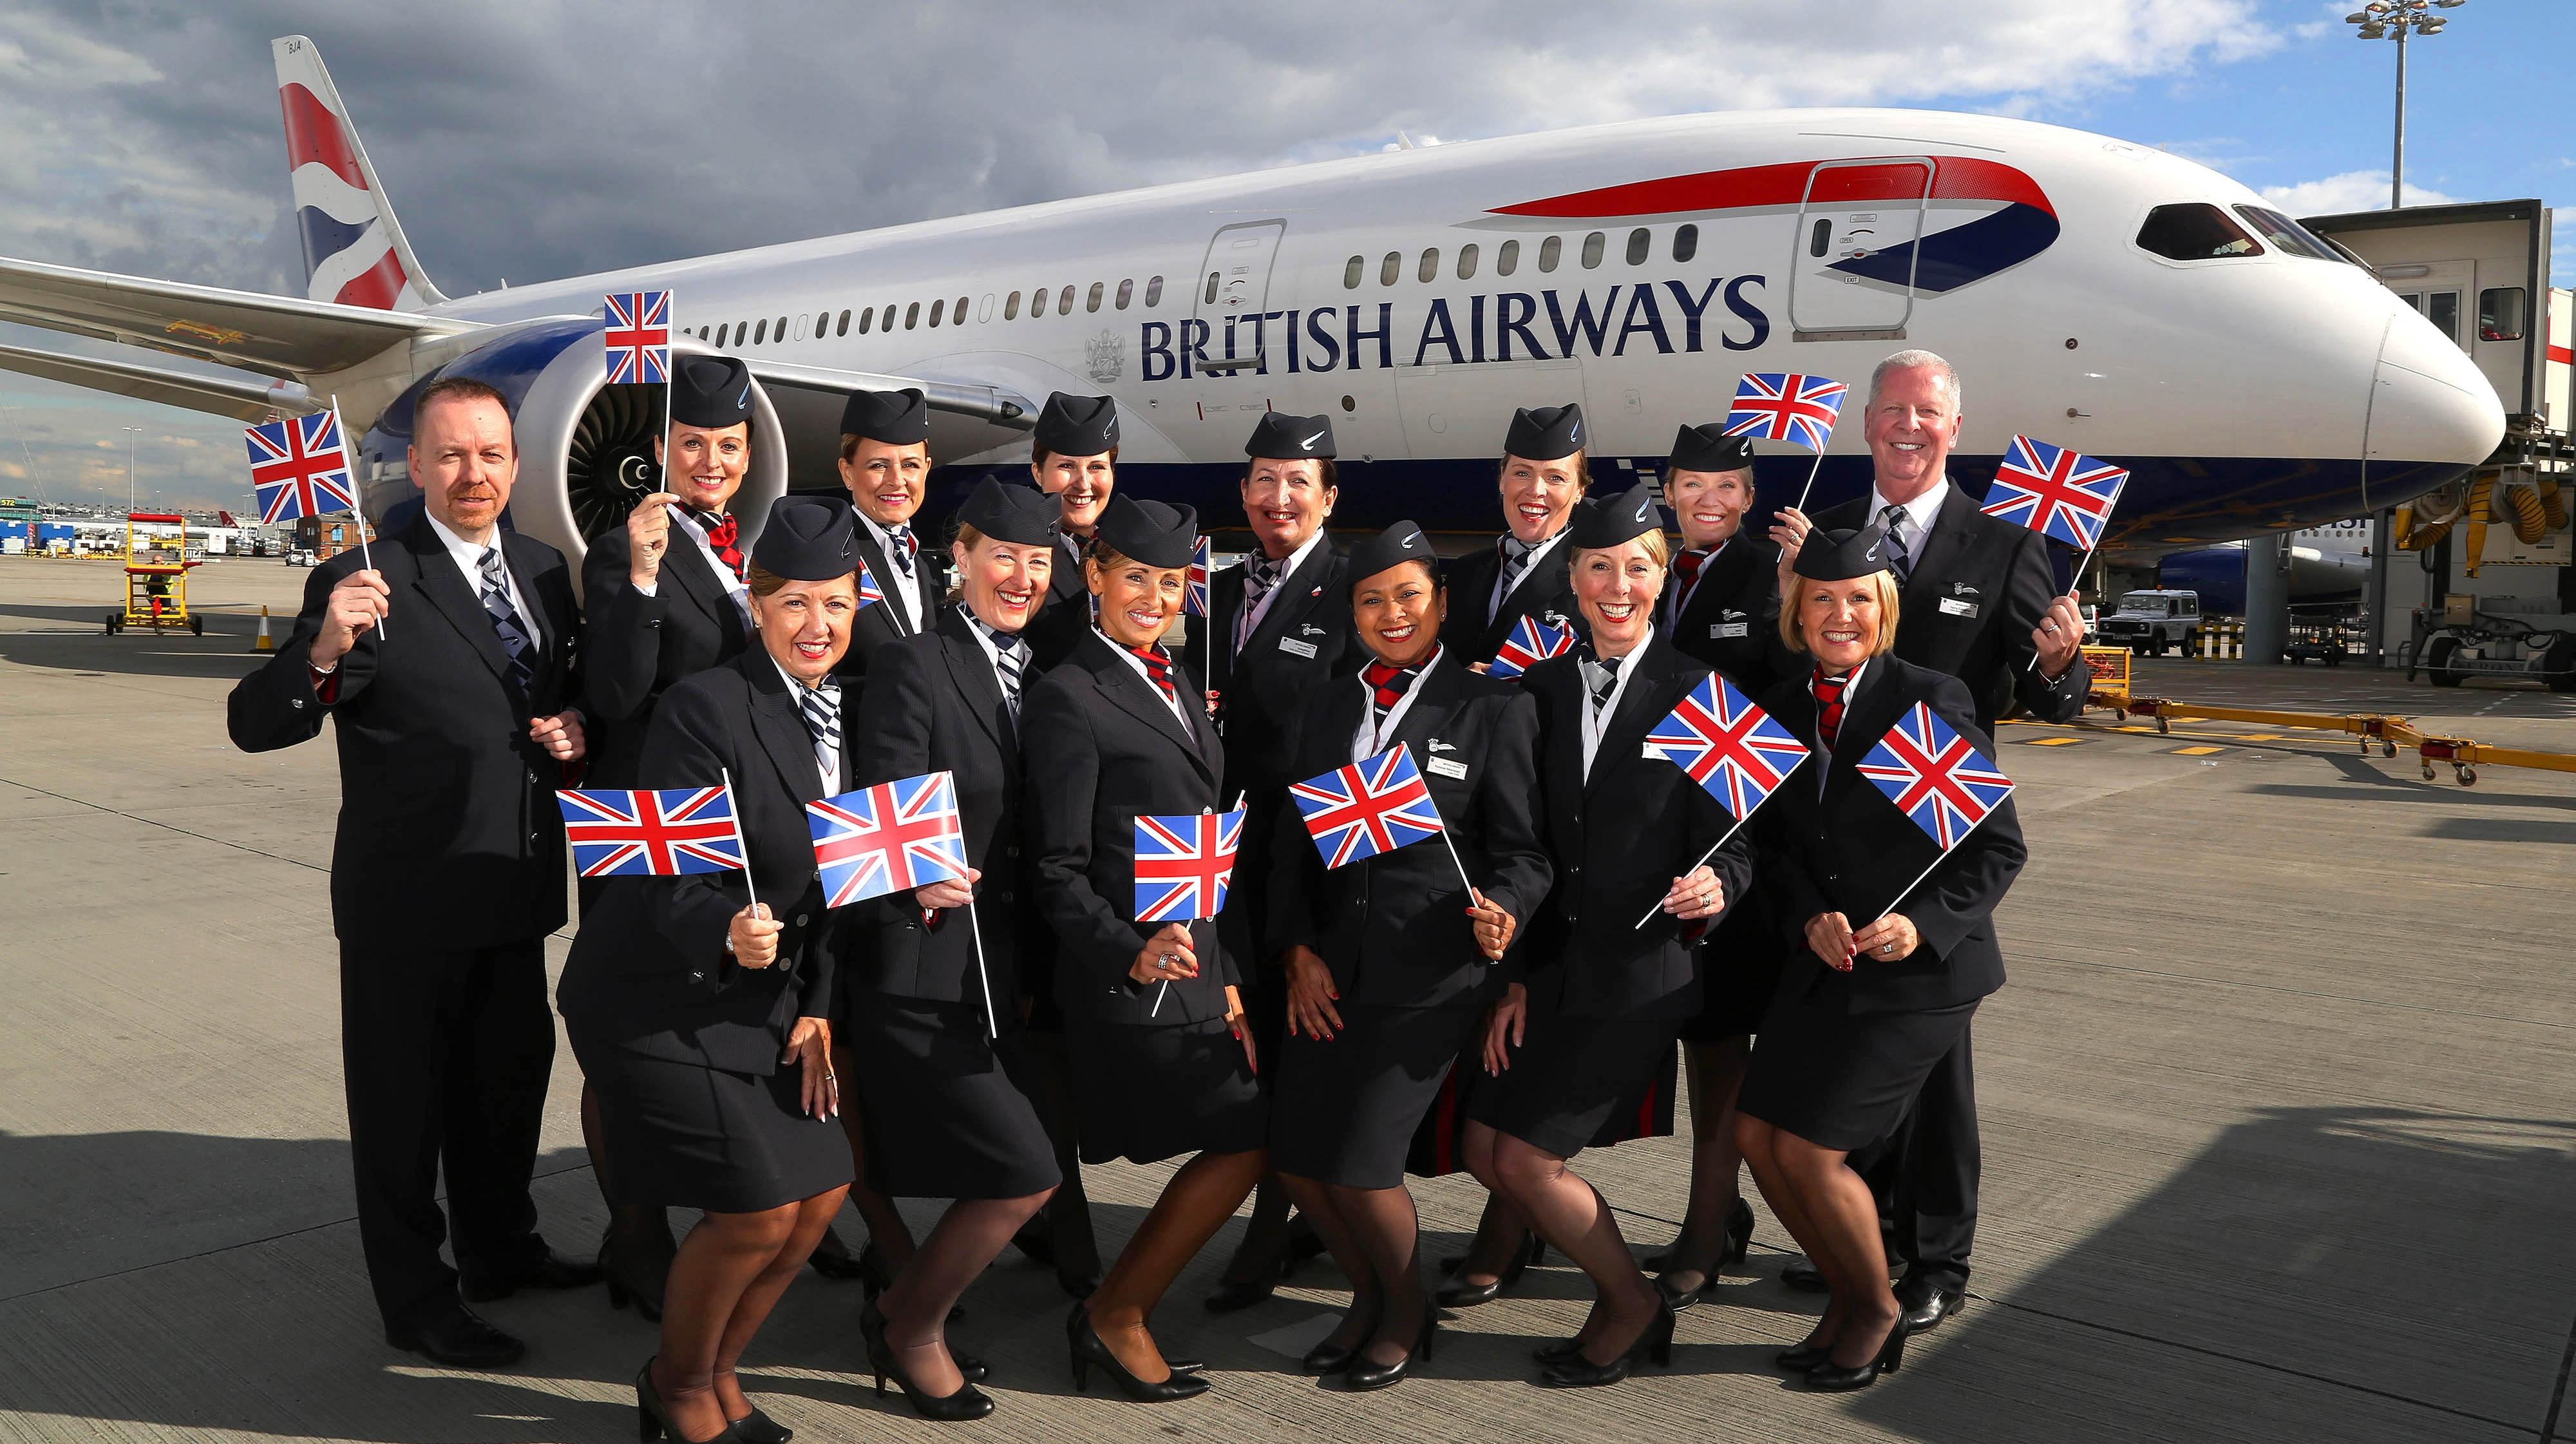 British Airways Employer and Employee Relations Essay